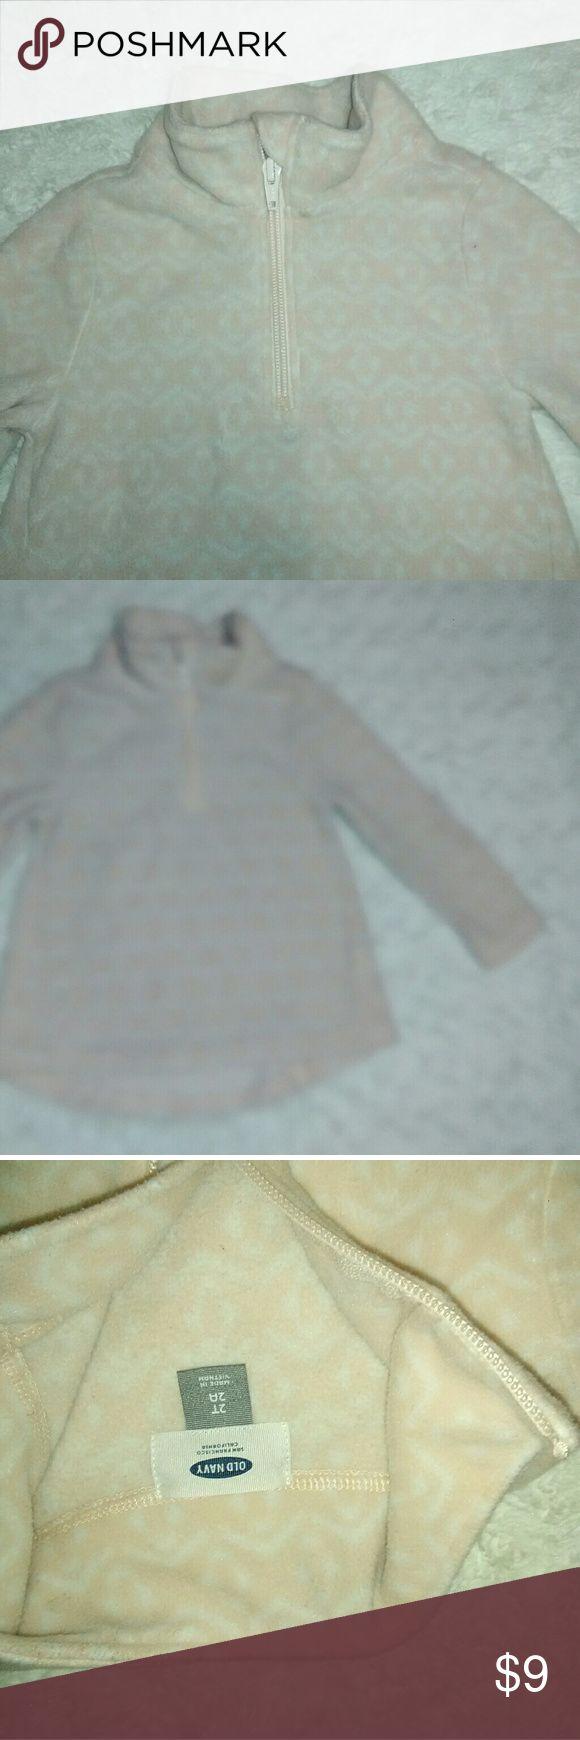 Old navy fleece pink and white Old navy fleece pink and white never worn no tags Old Navy Jackets & Coats